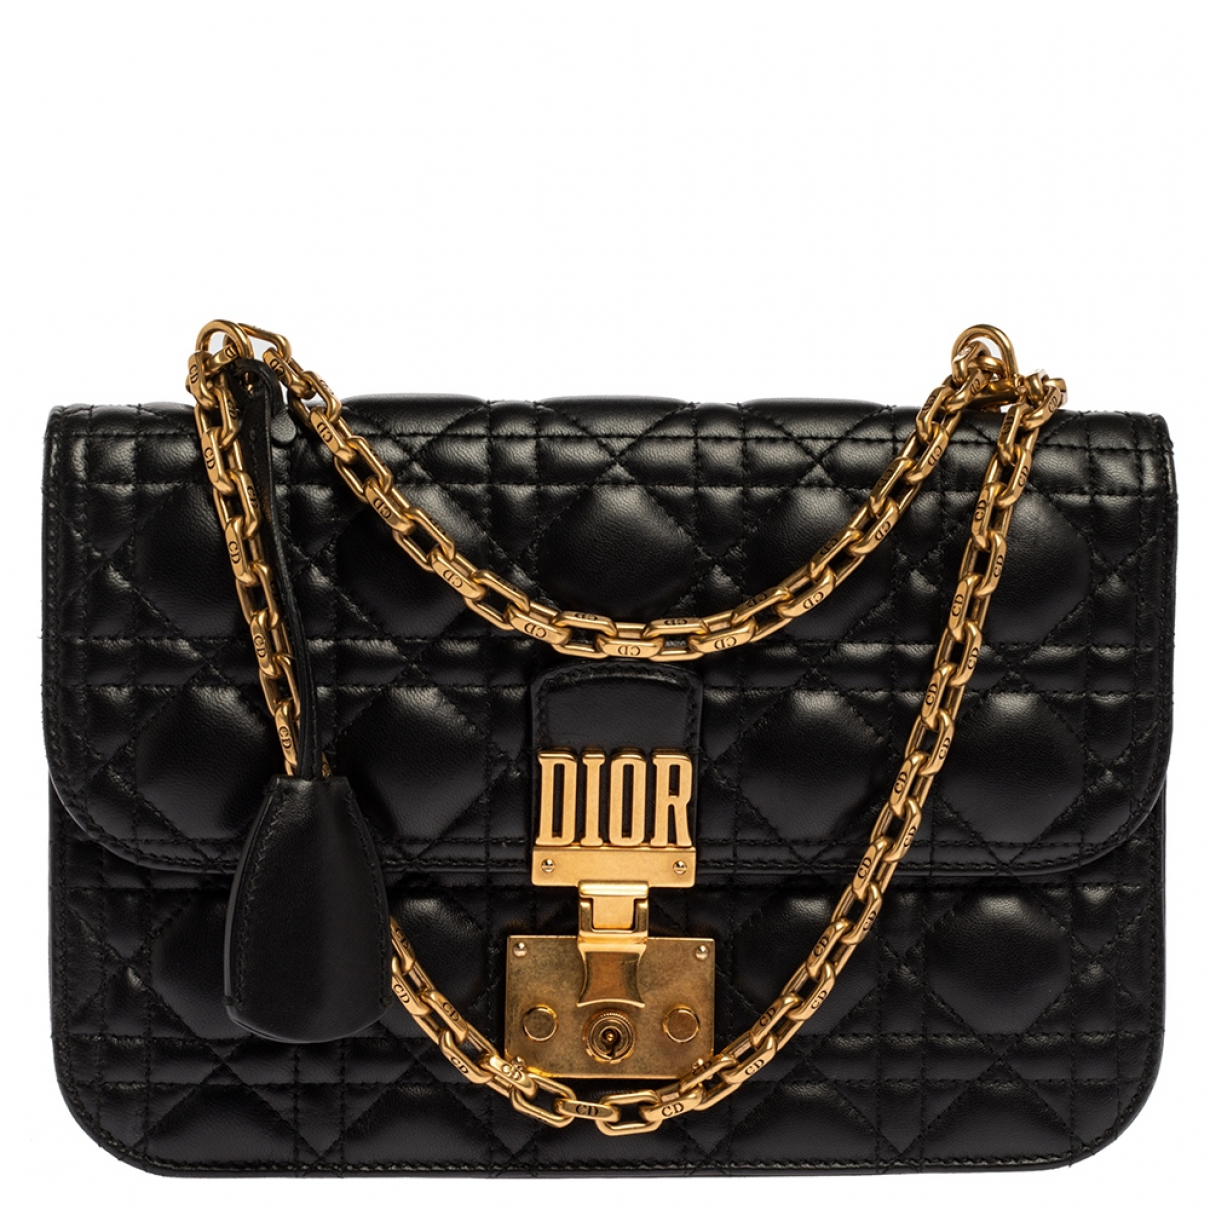 Dior DiorAddict Black Leather handbag for Women N